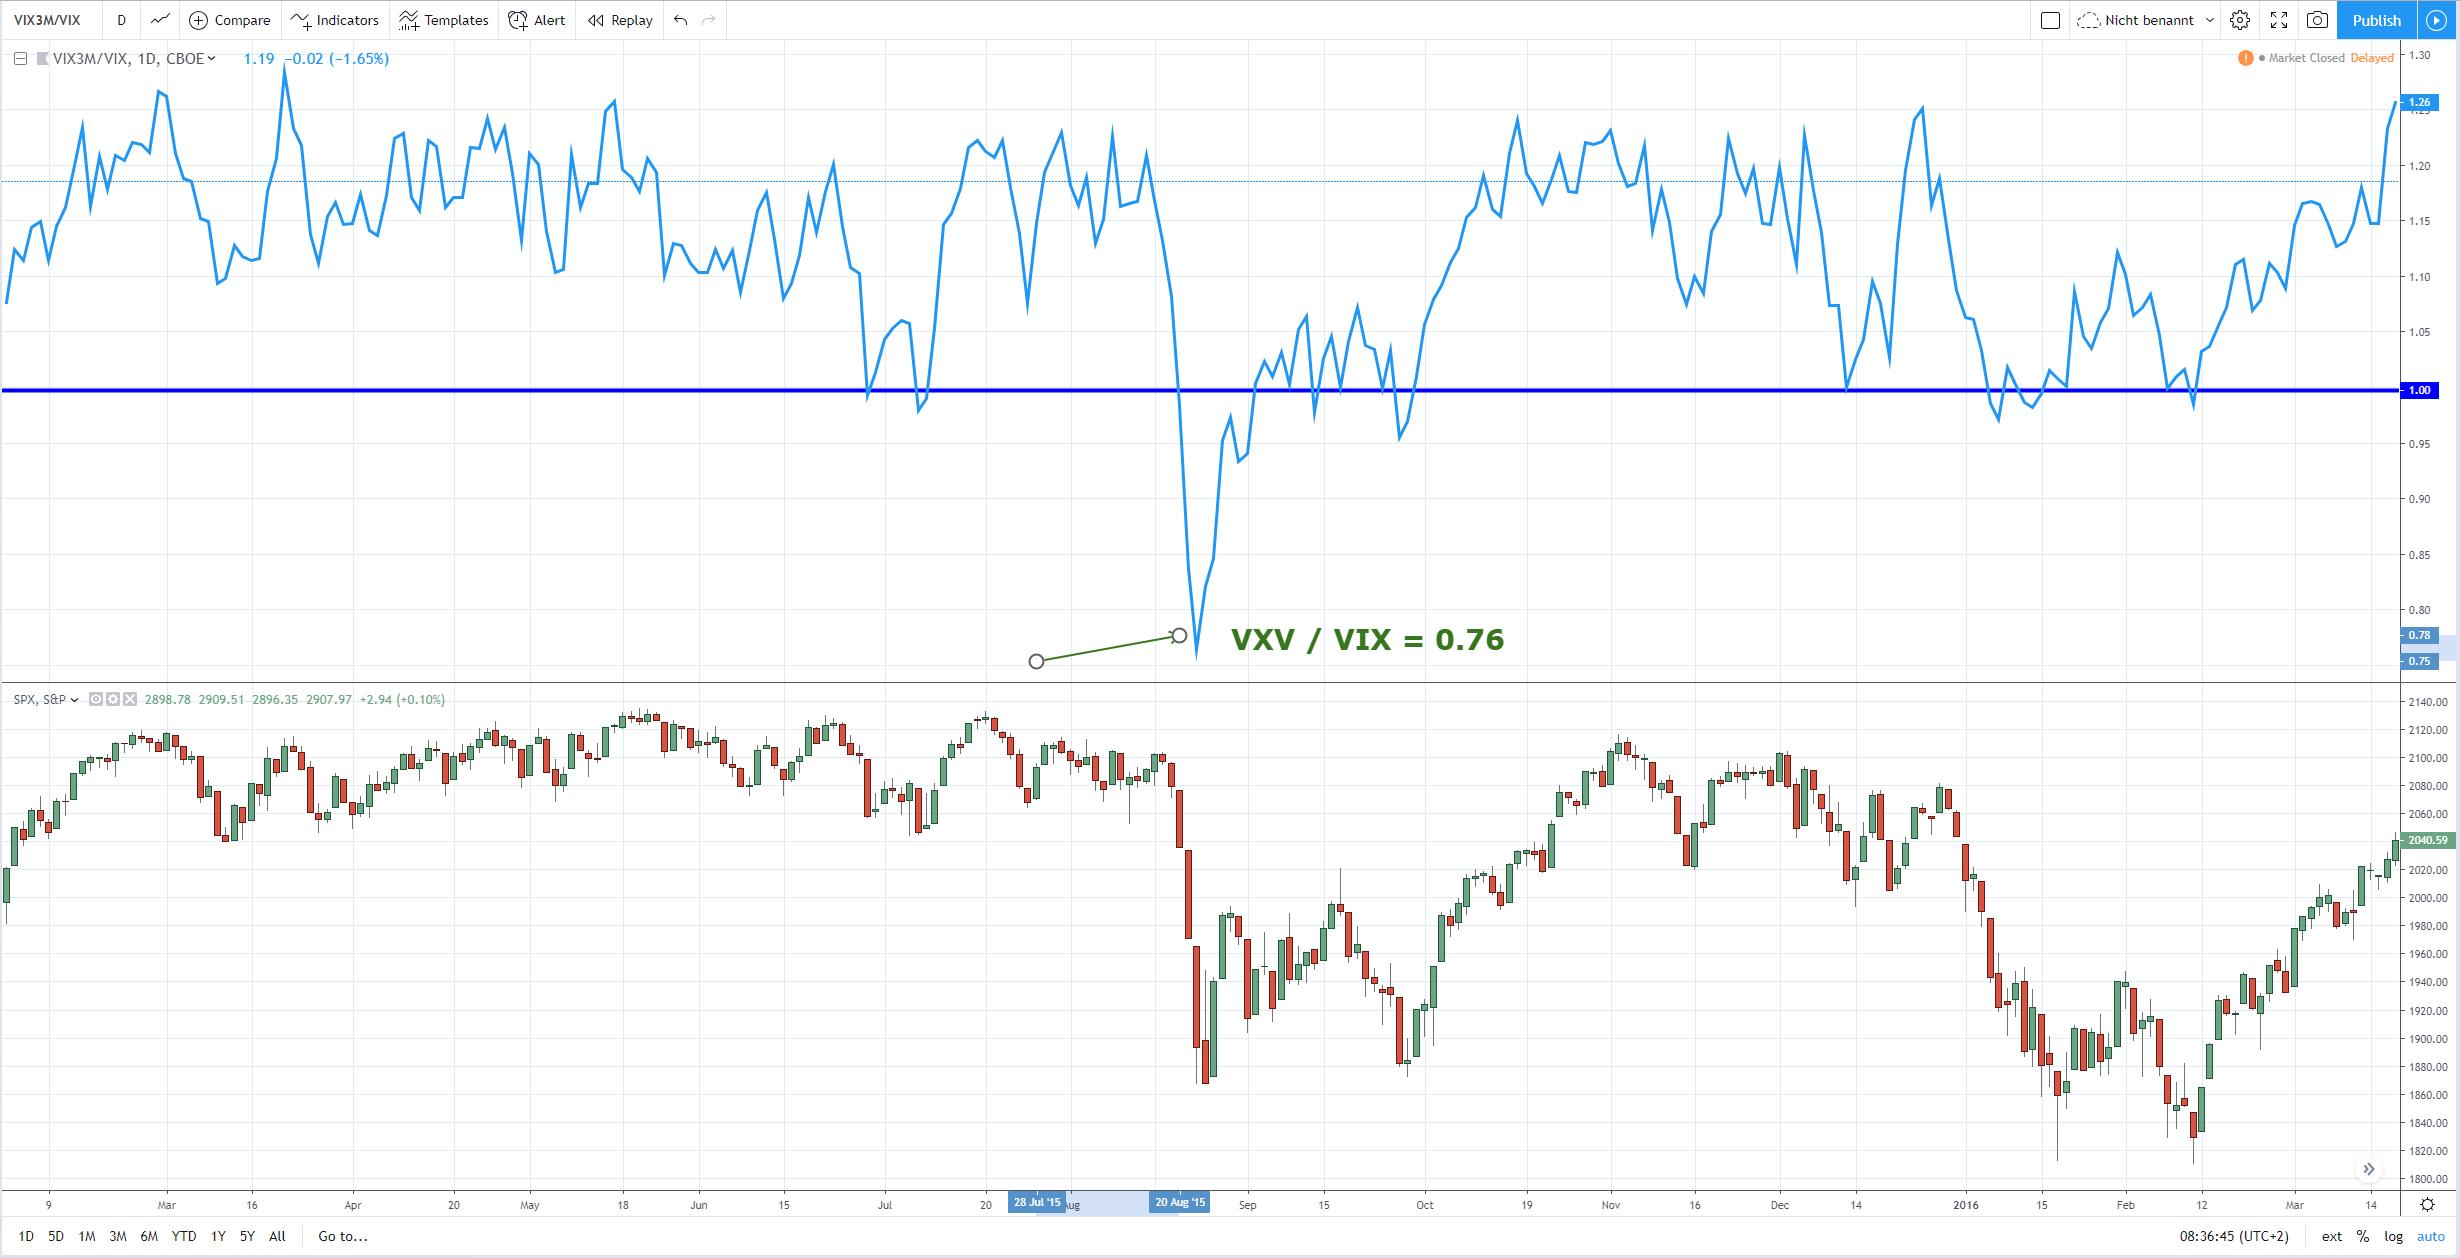 VXV-VIX-Ratio Beispiel Aug 2015